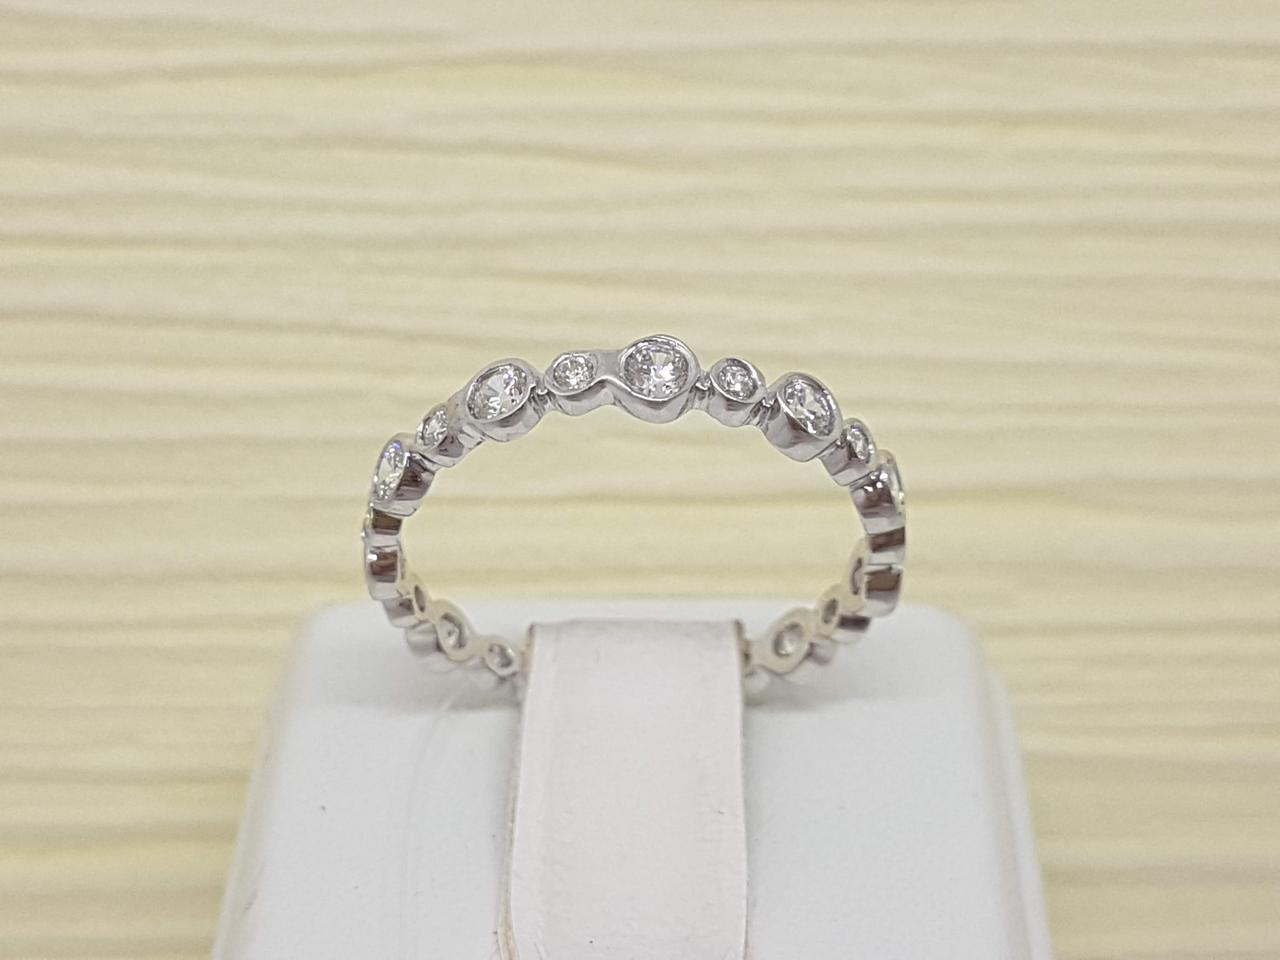 Серебряное кольцо с фианитами. Артикул 901-01006 15